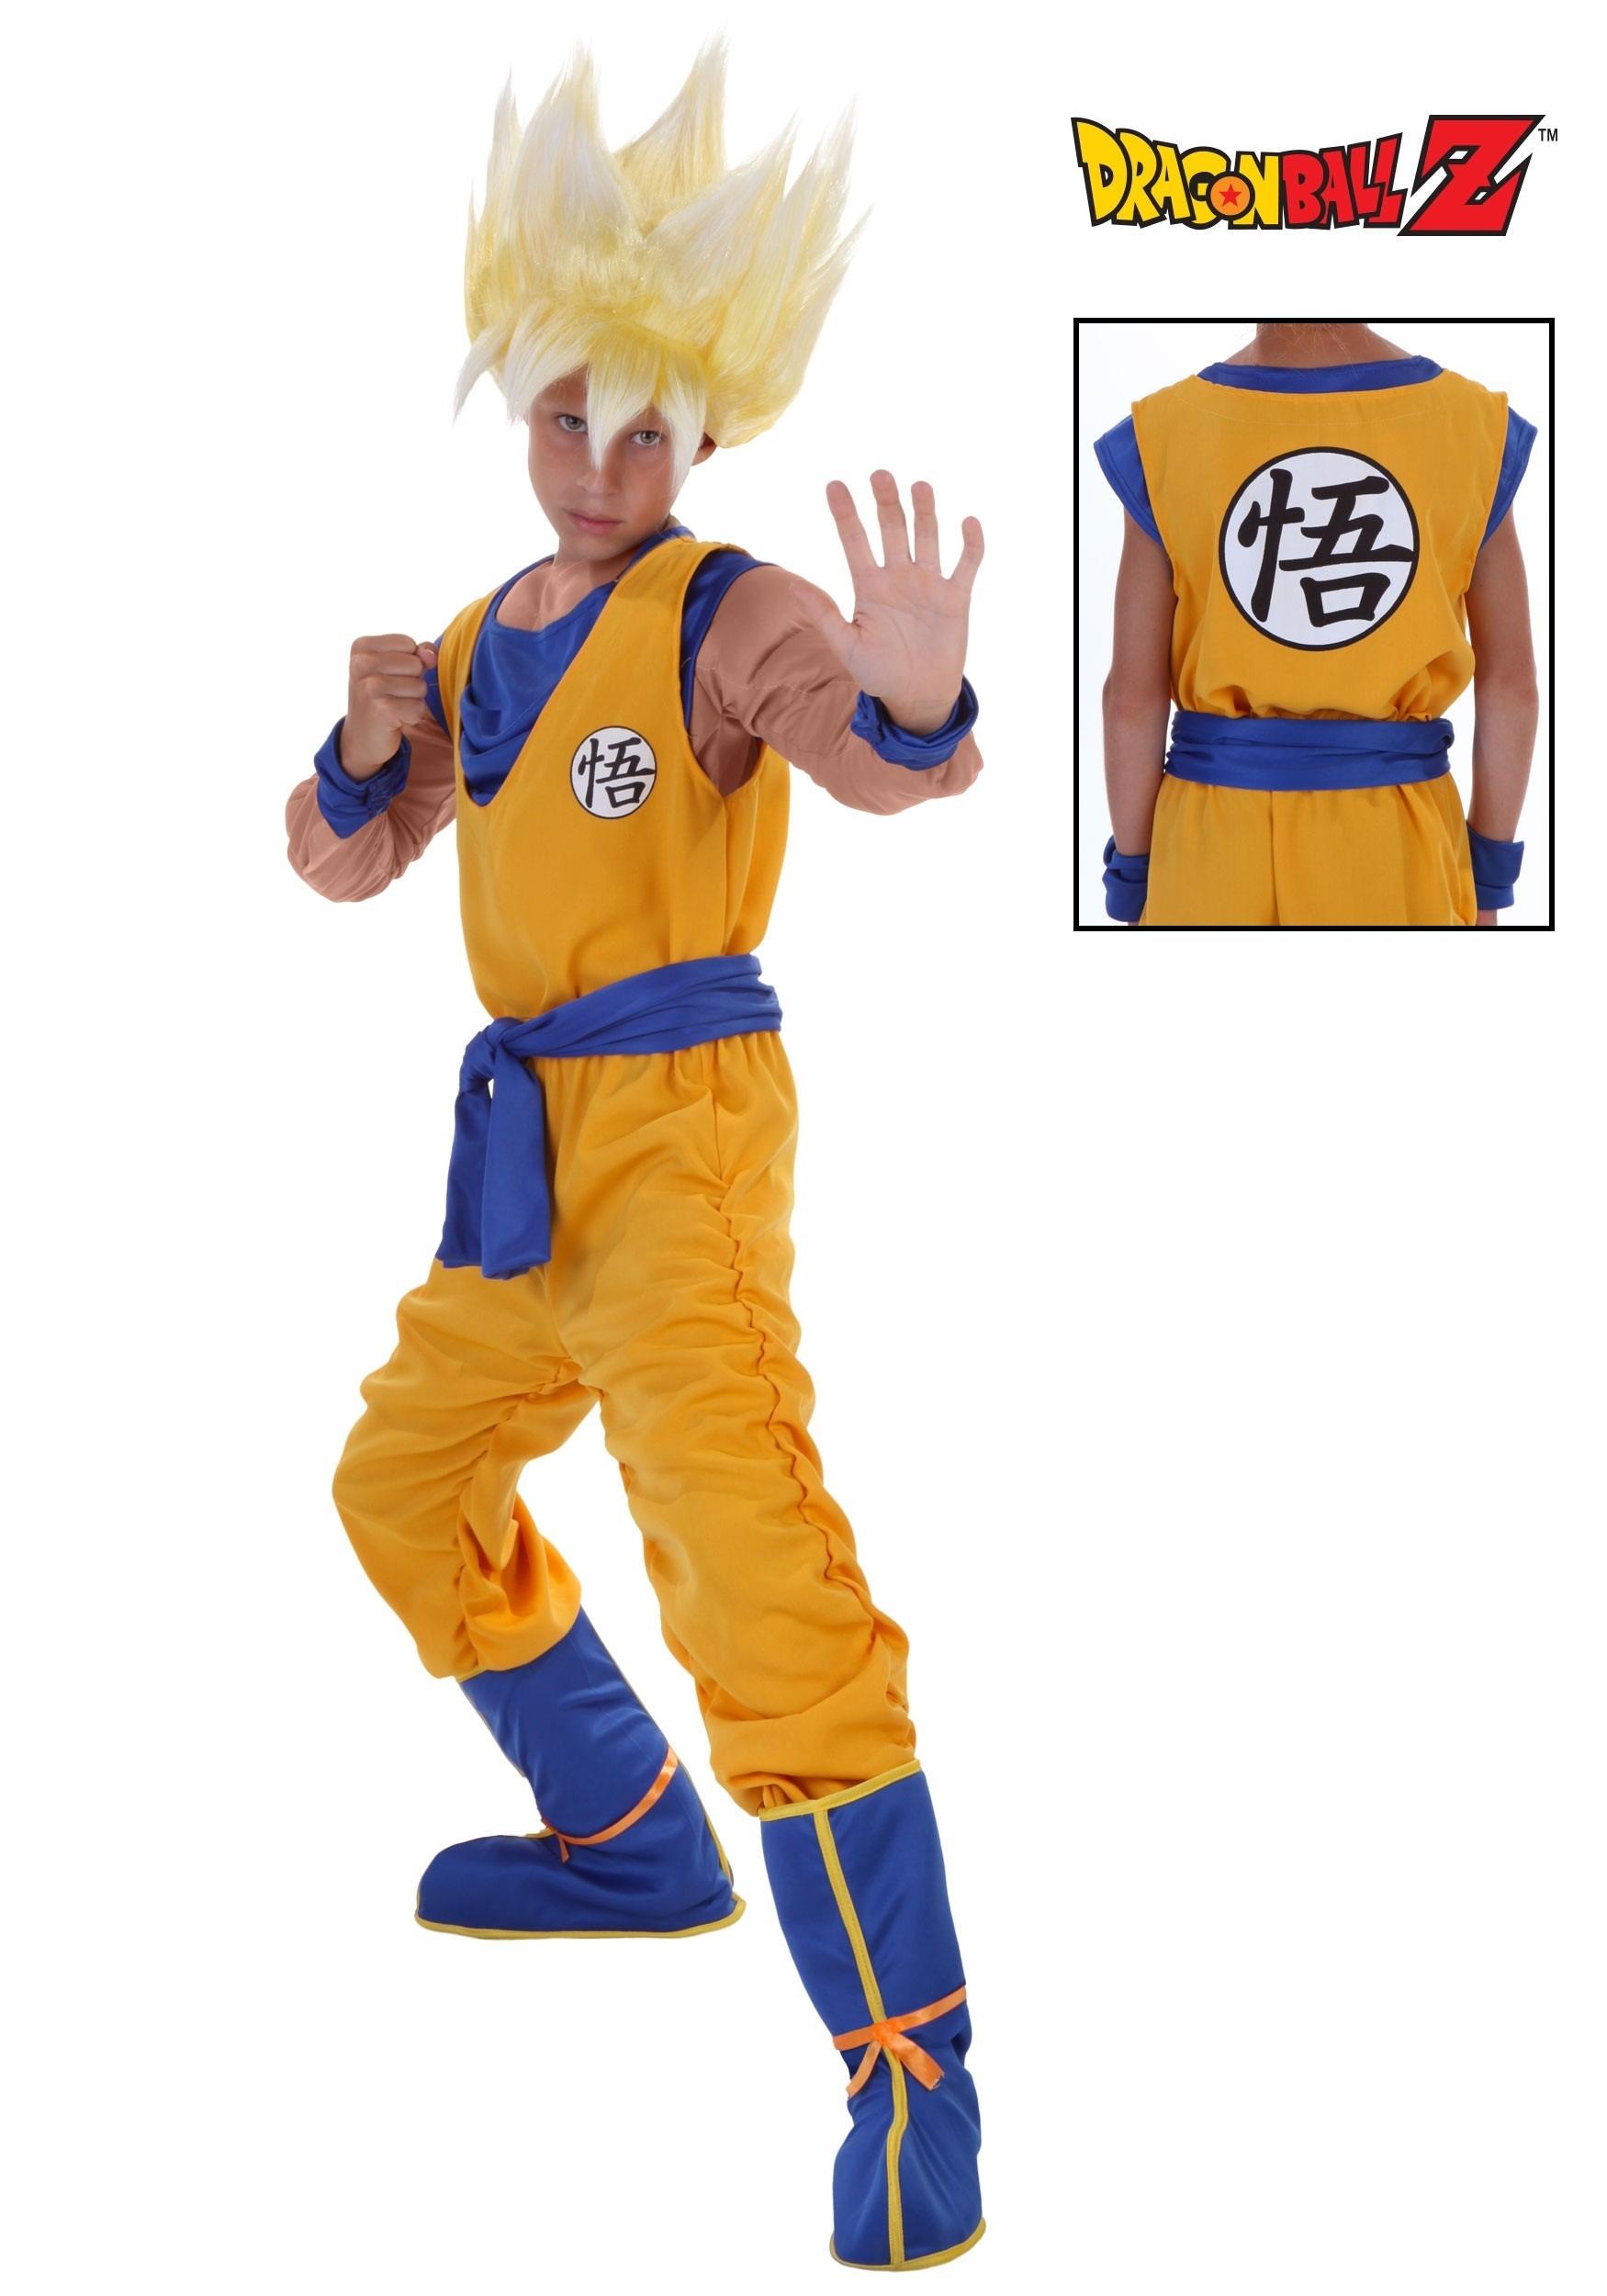 DBZ Child Super Saiyan Goku  sc 1 st  Fun.com & DBZ Child Super Saiyan Goku Costume